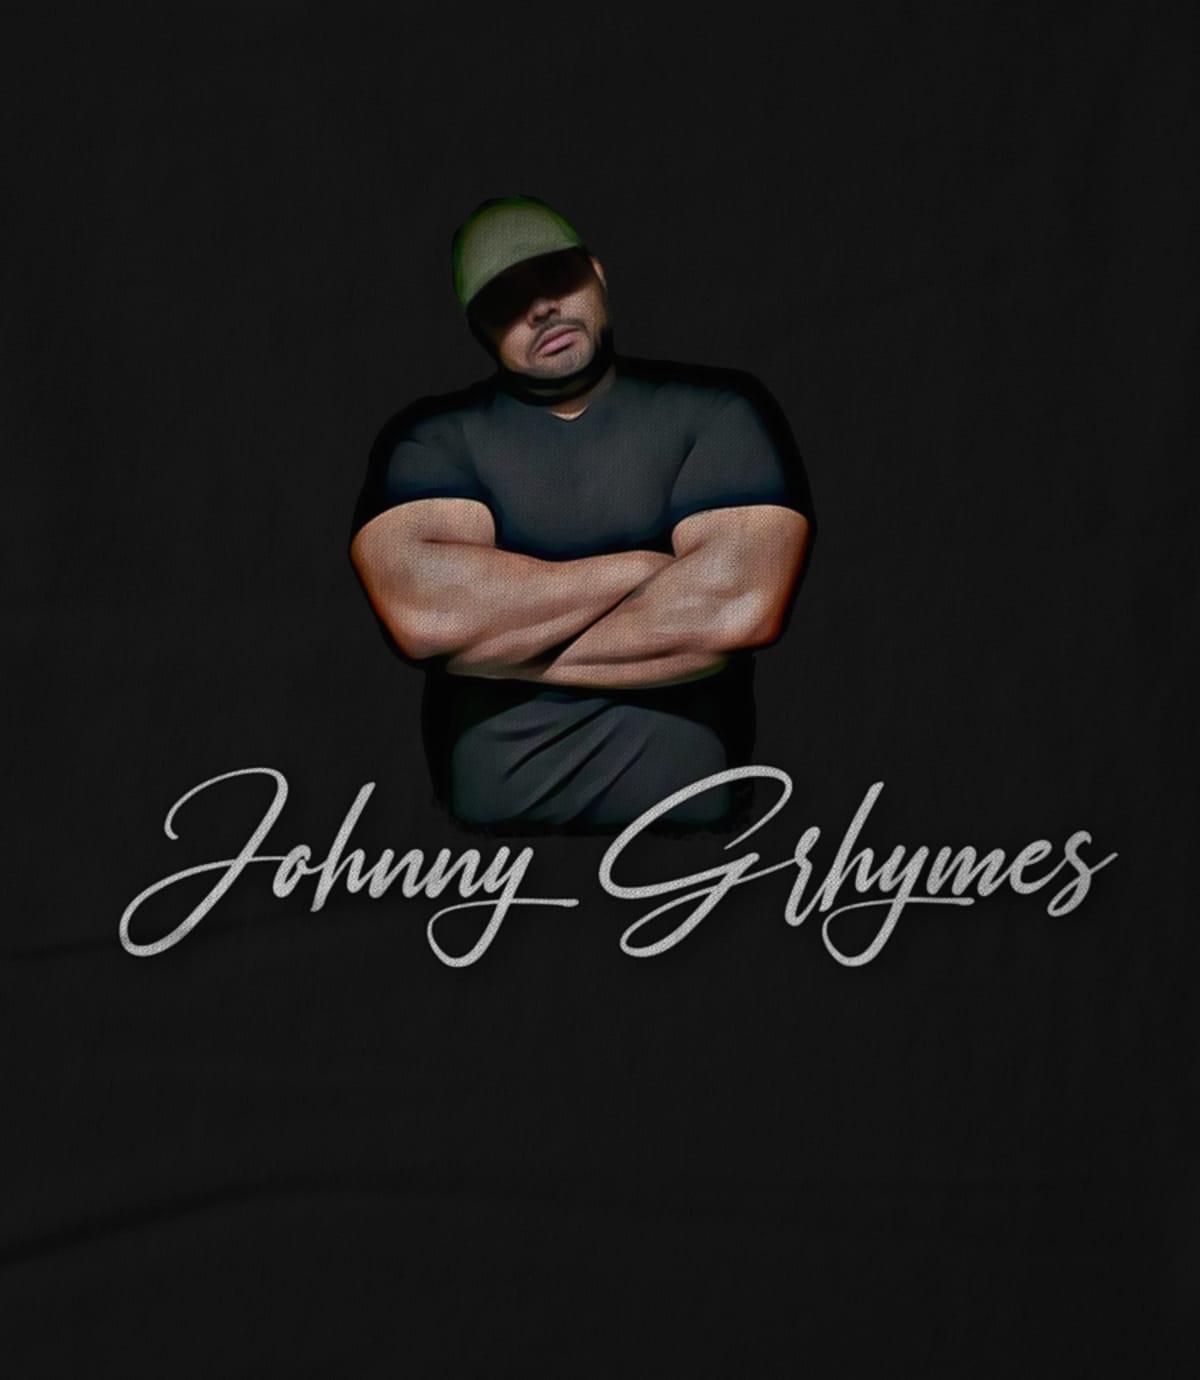 Johnny Grhymes